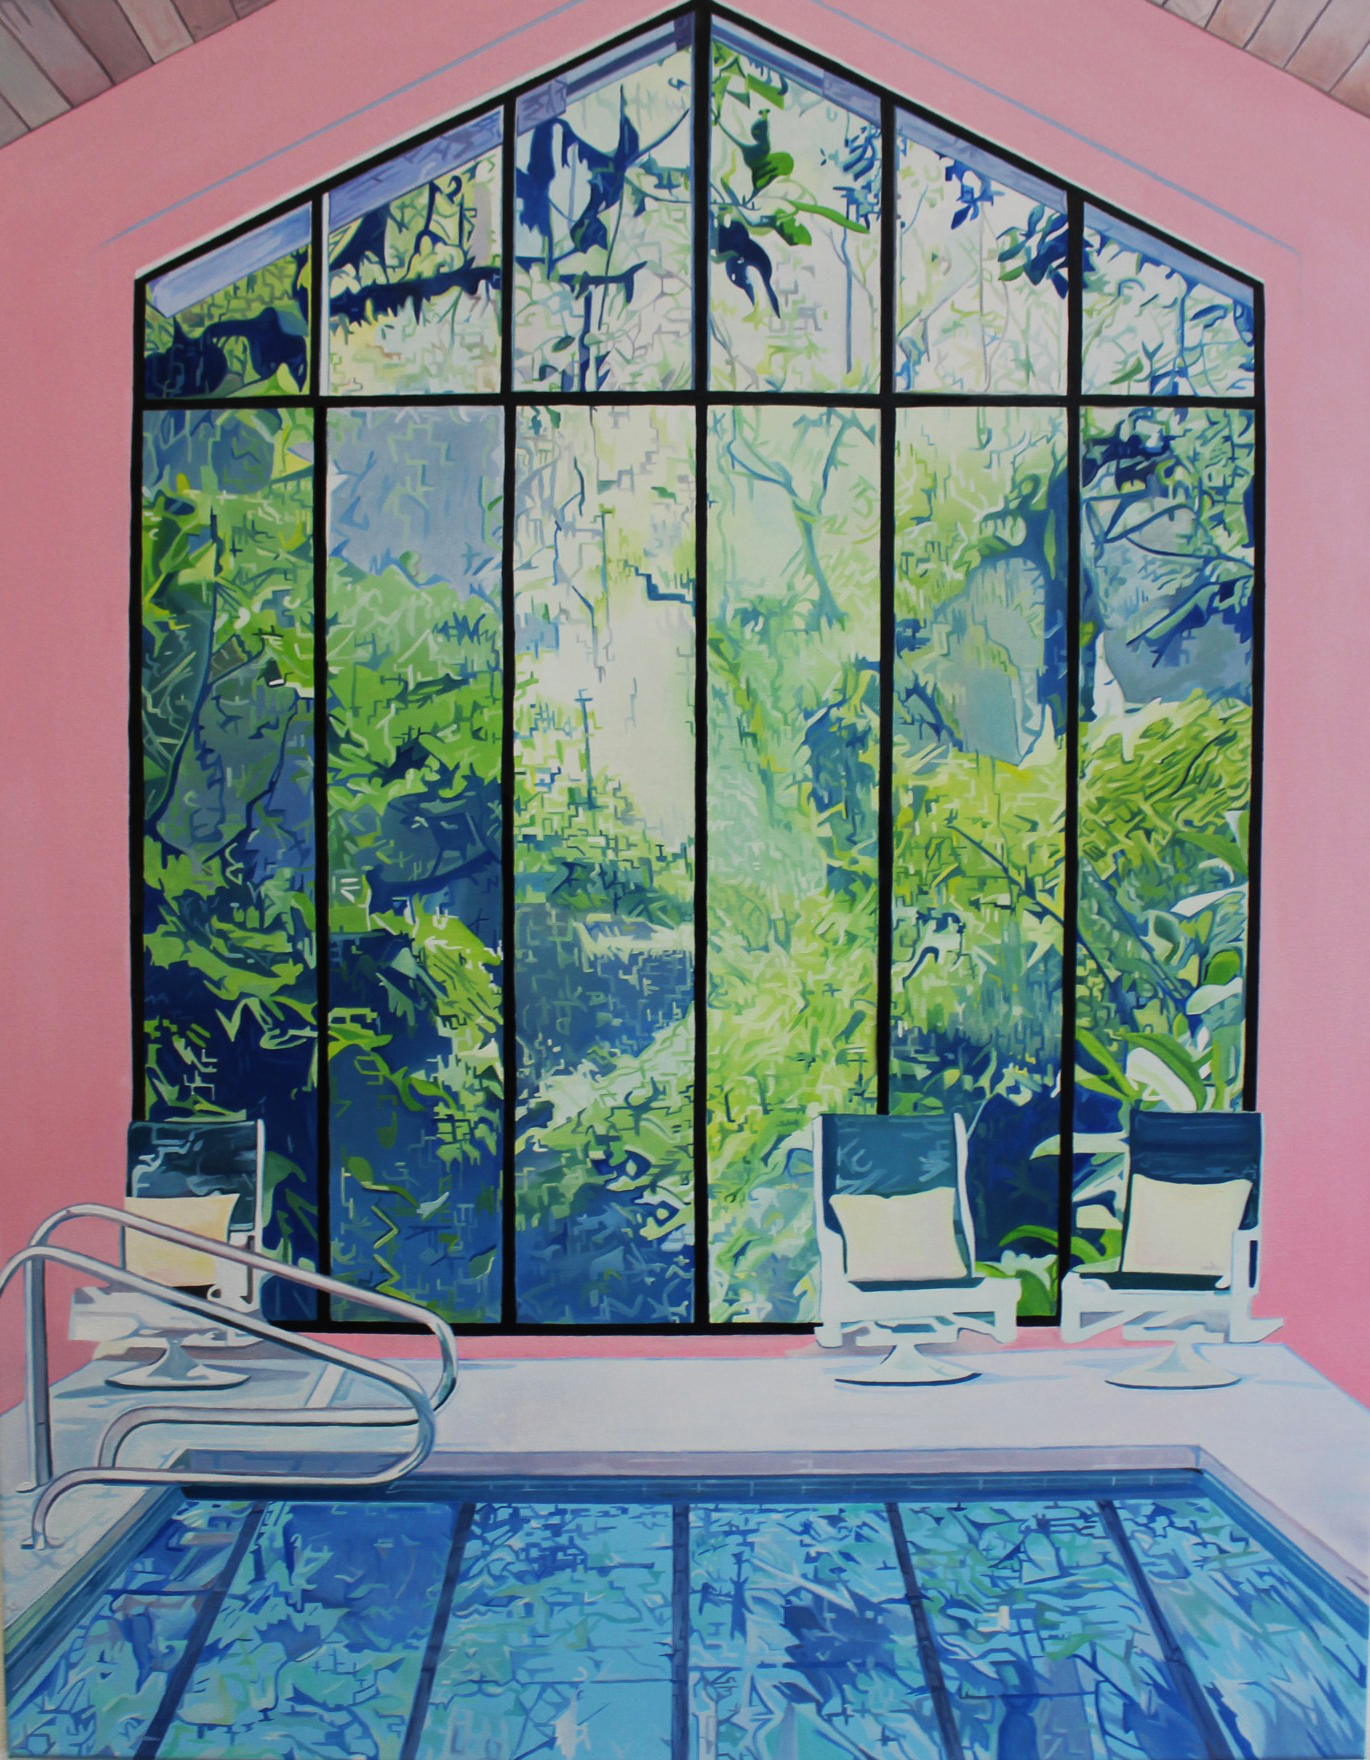 DegreeArt.com , Kirsty Simmons,  Breathtaking Hideaway , 2019, Oil on wooden panel, 35.5 x 27.5 in.